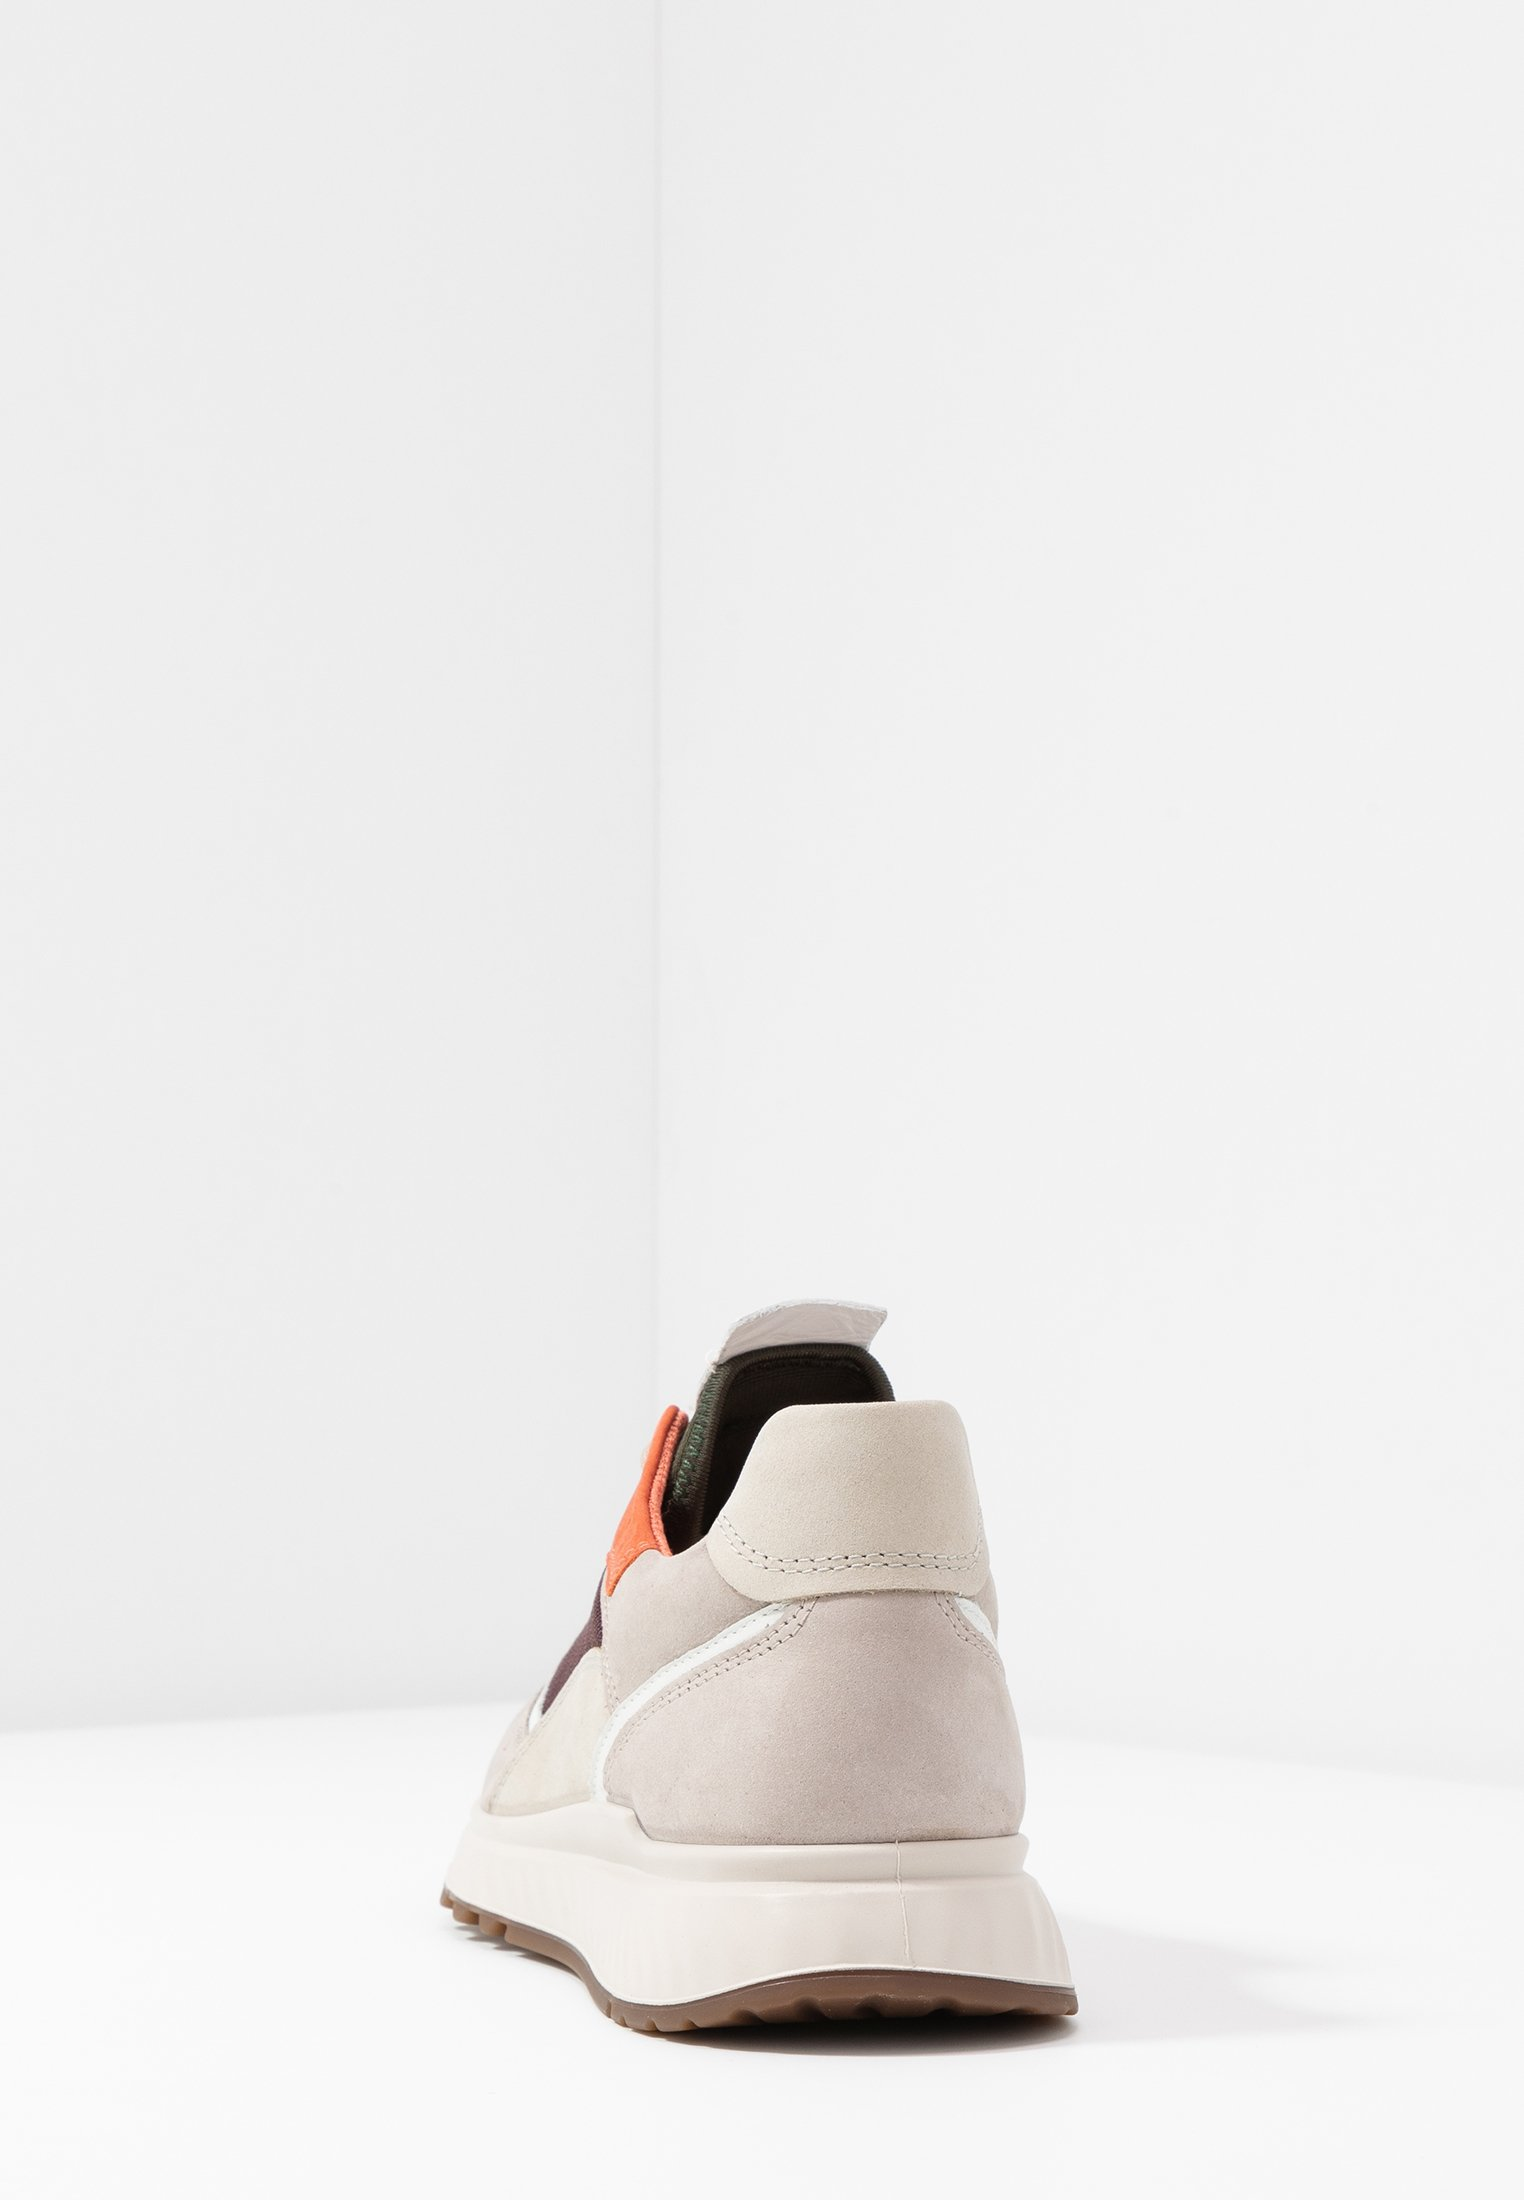 ECCO ST.1 W Sneaker low gravelwhitegrey roseapricot